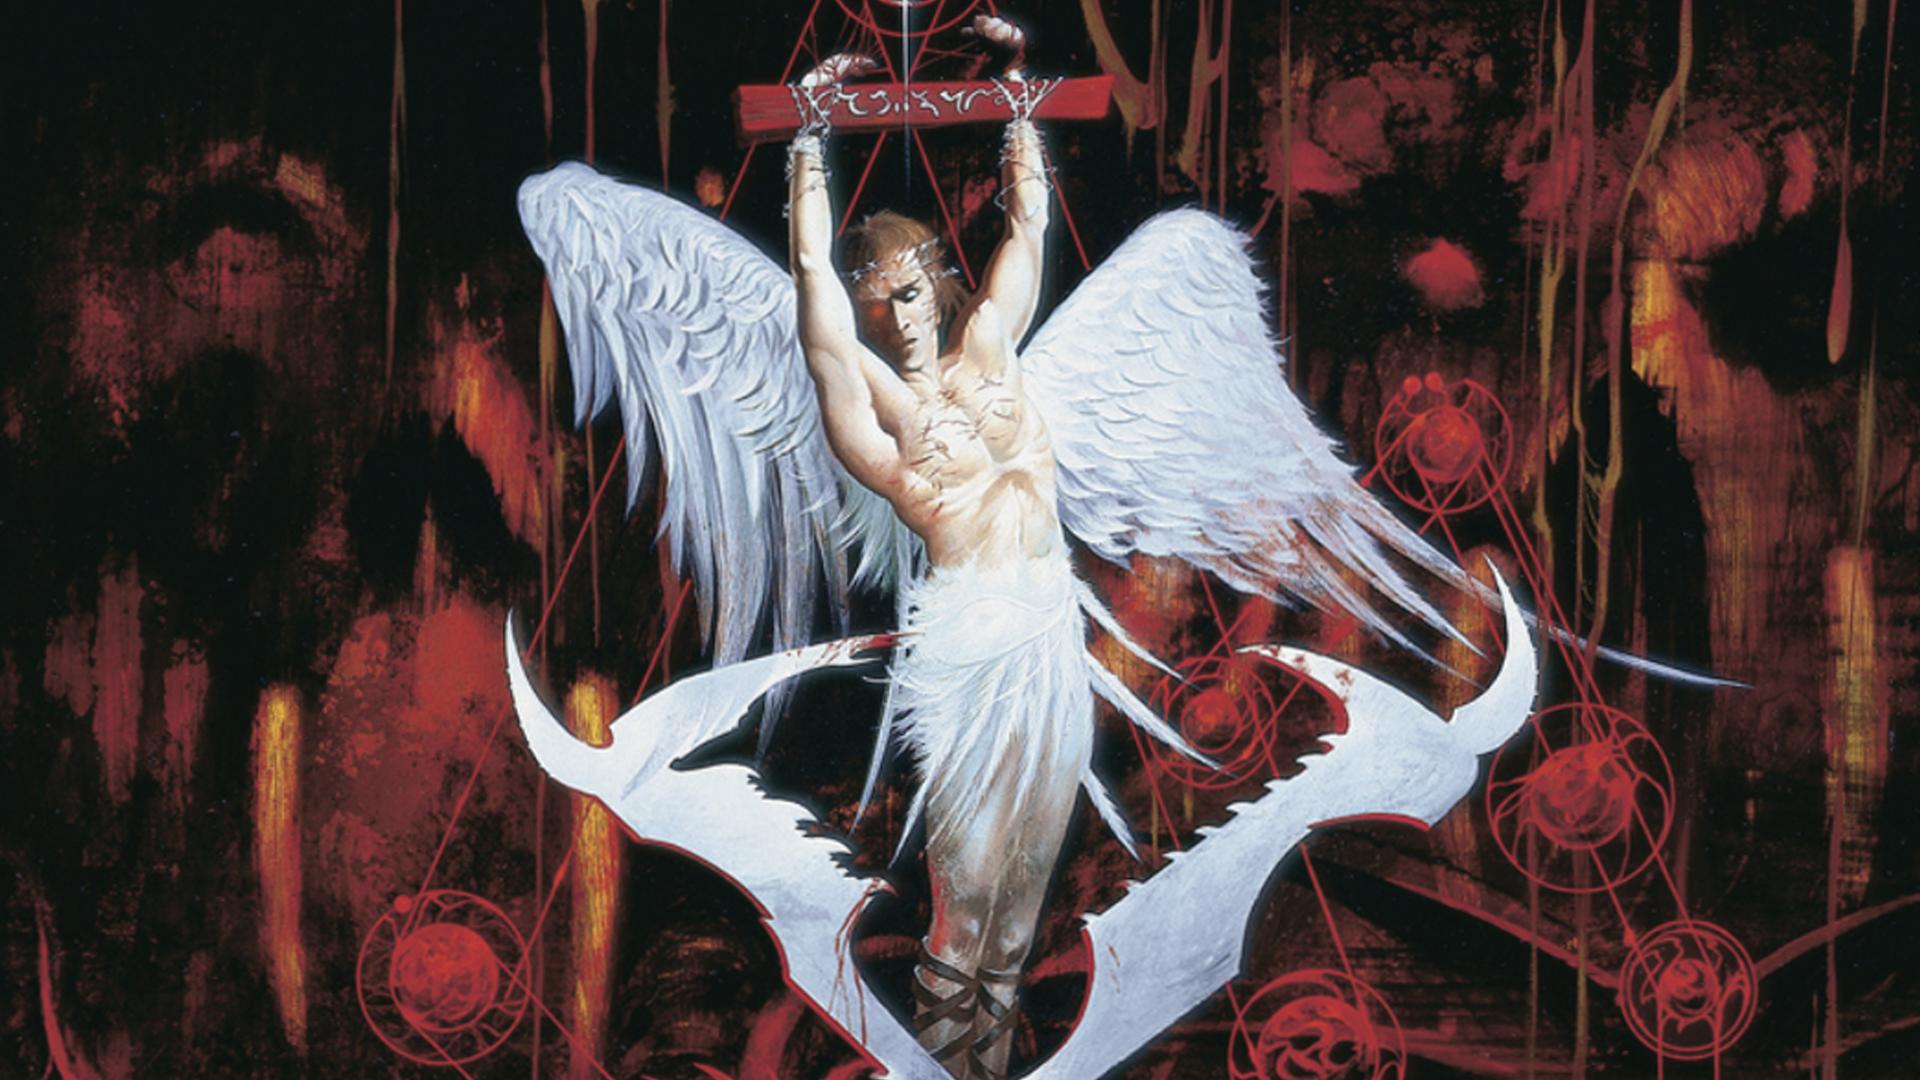 Kult: Divinity Lost rpg artwork